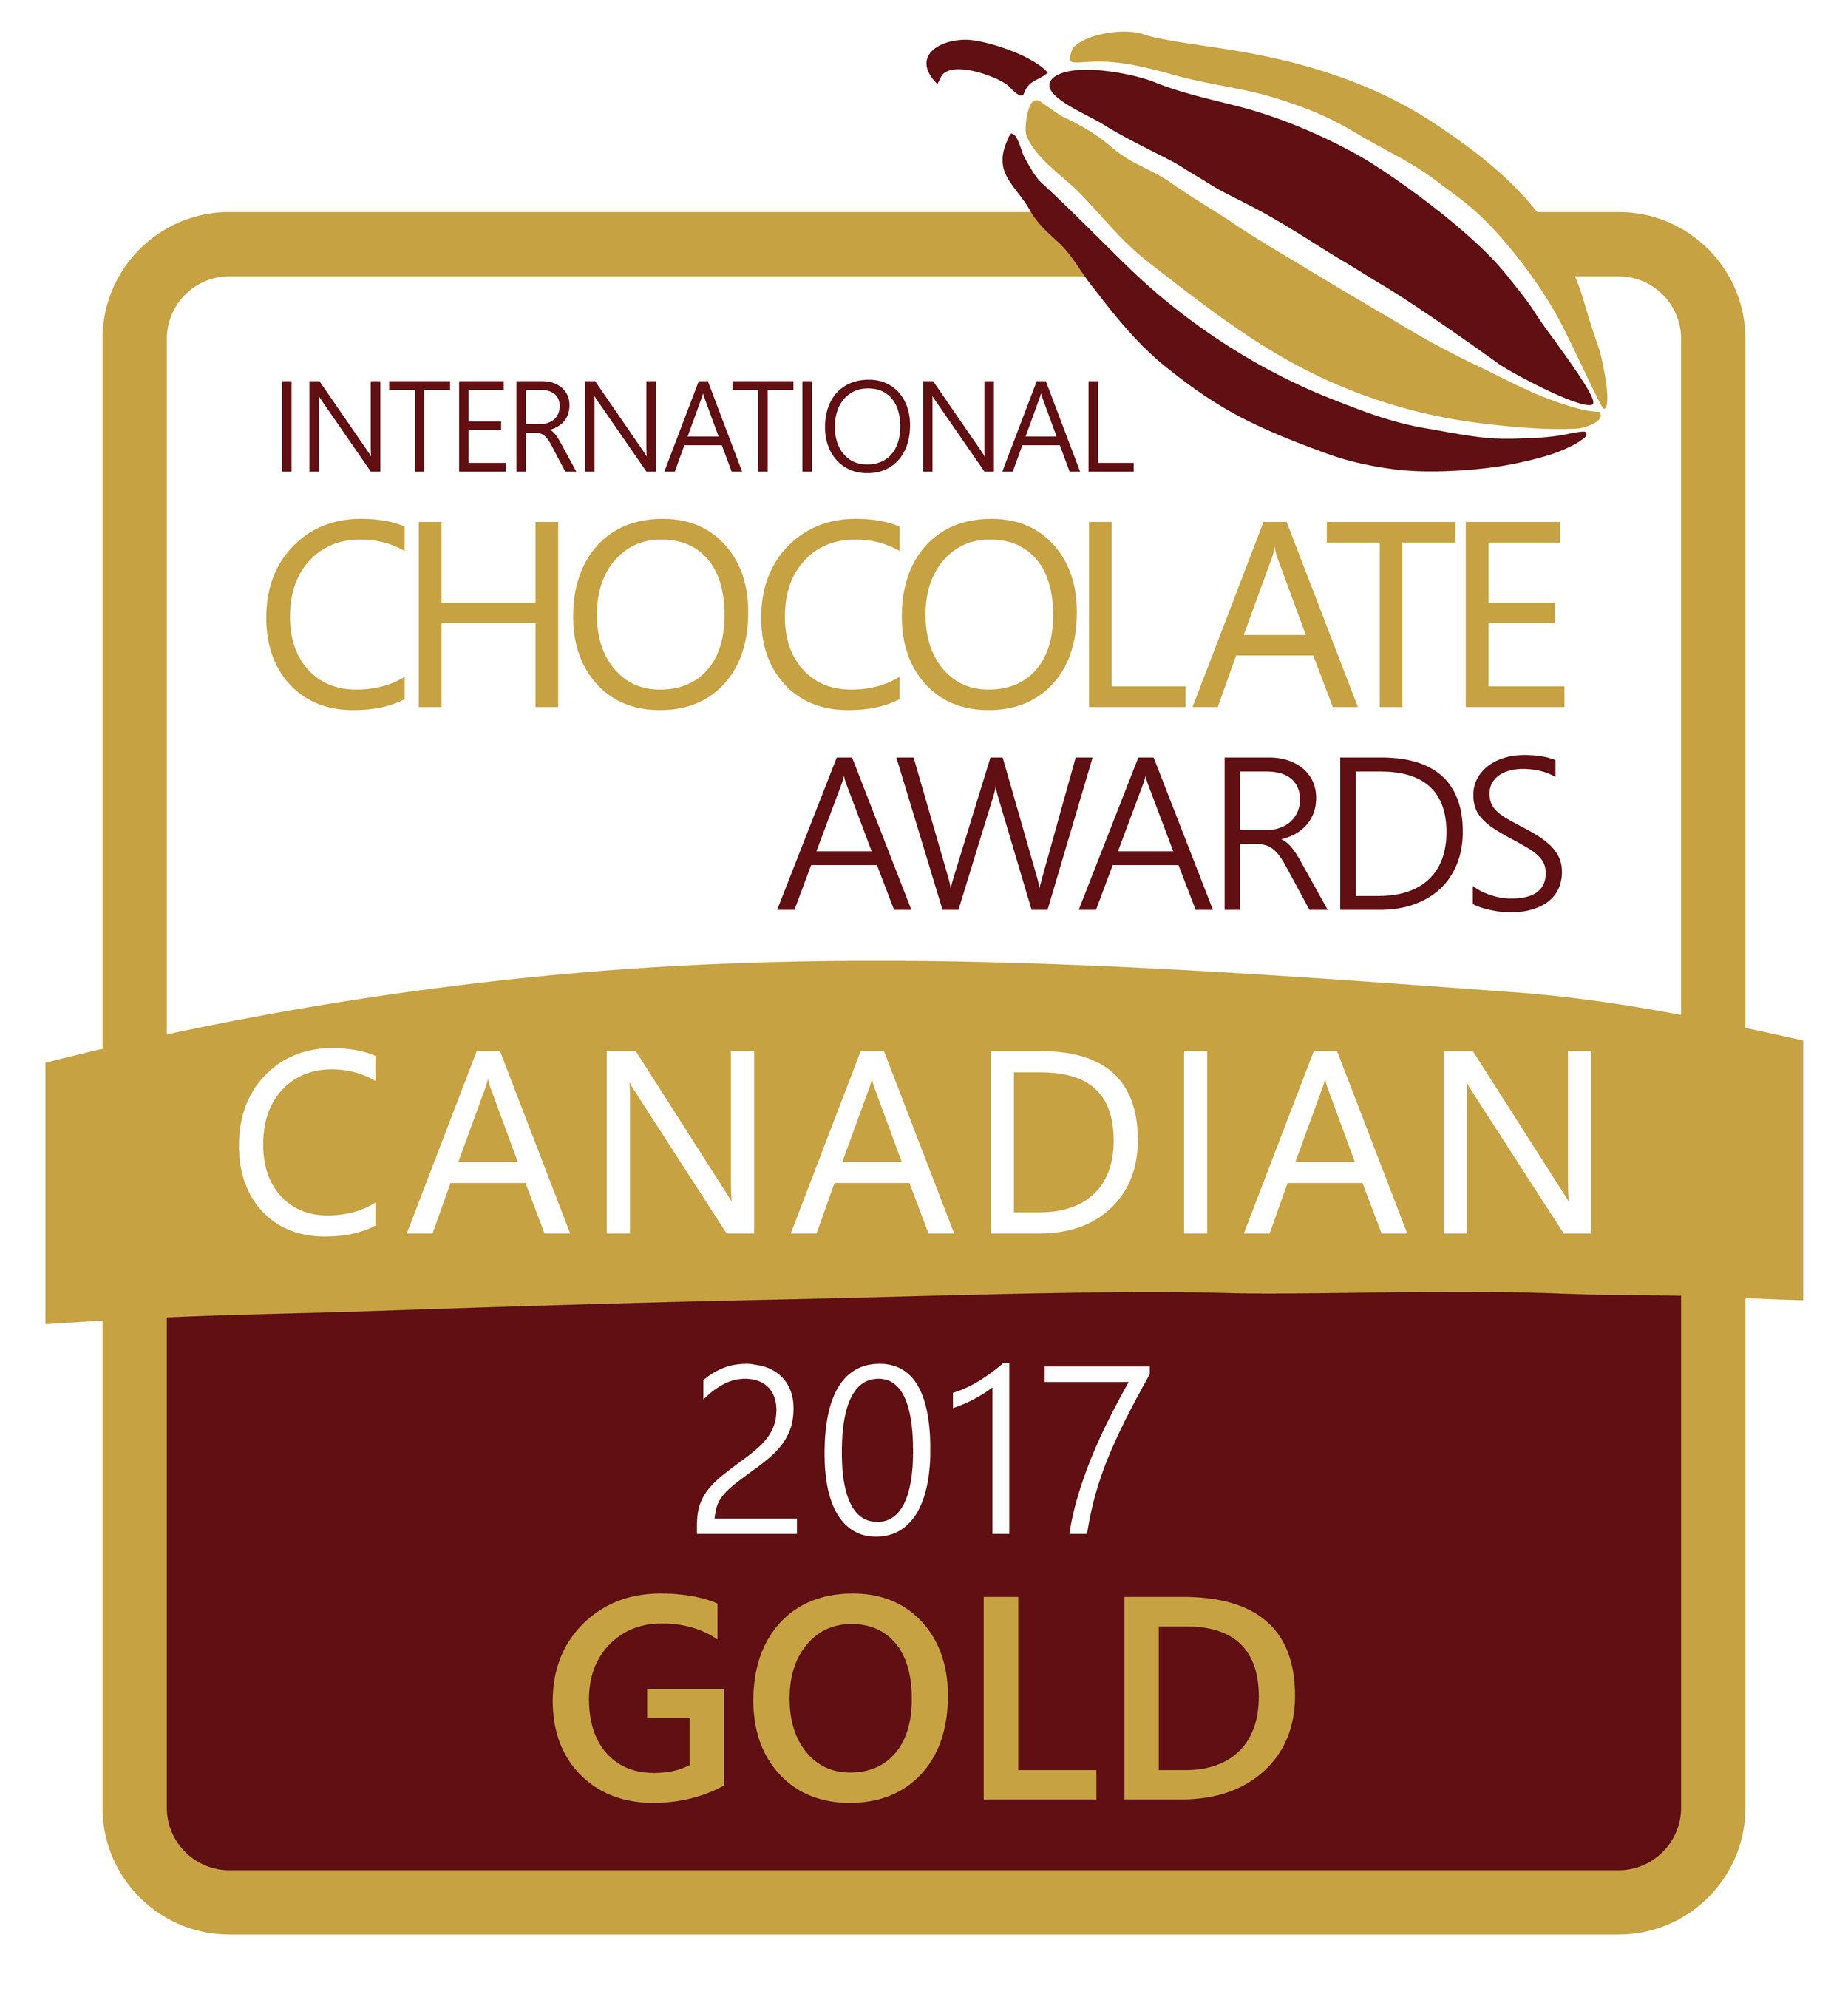 ica-prize-logo-2017-gold-canadian-rgb.jpg